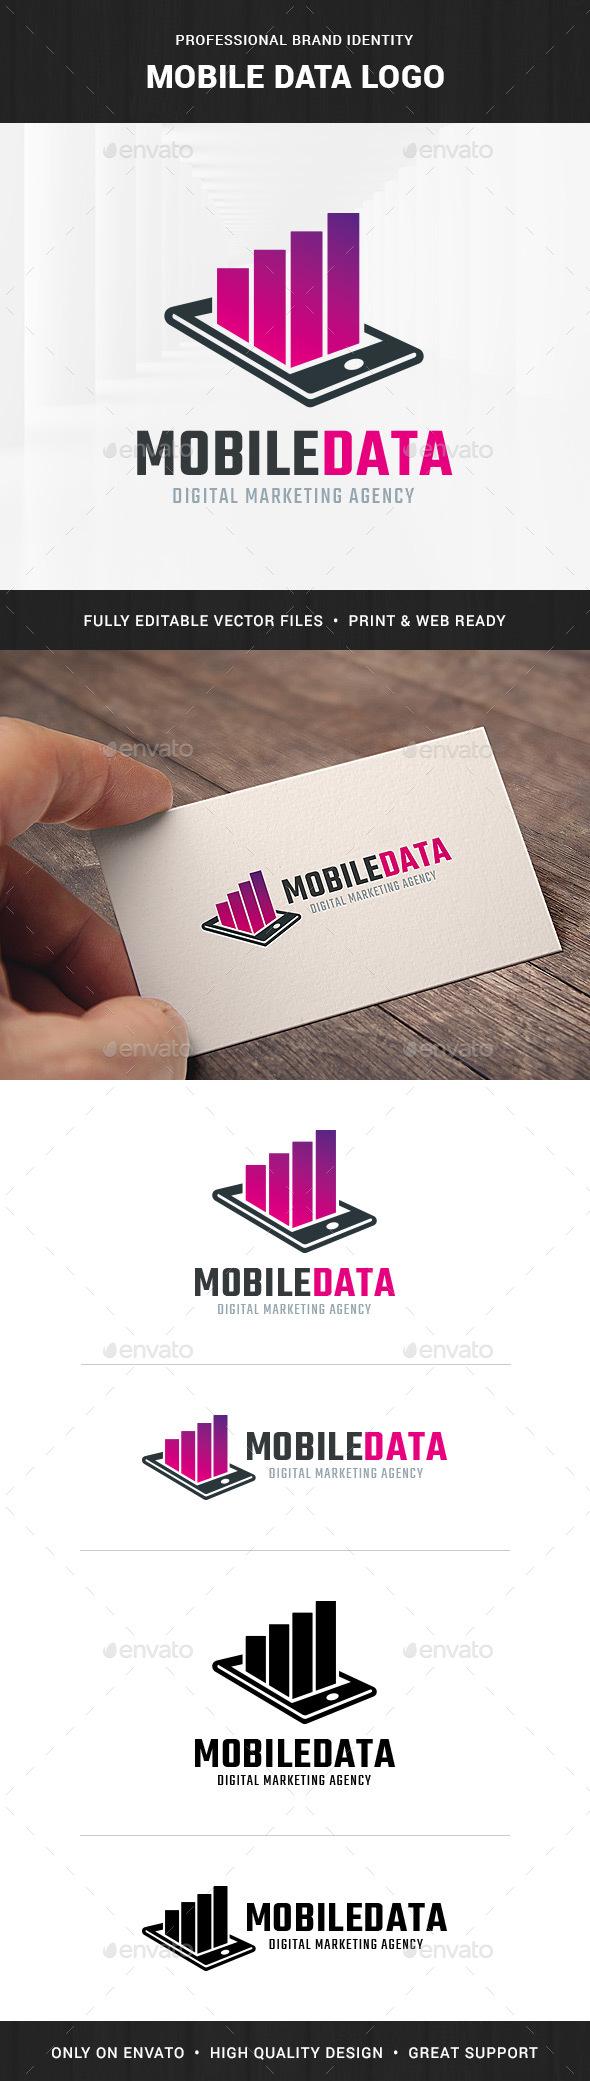 Mobile Data Logo Template